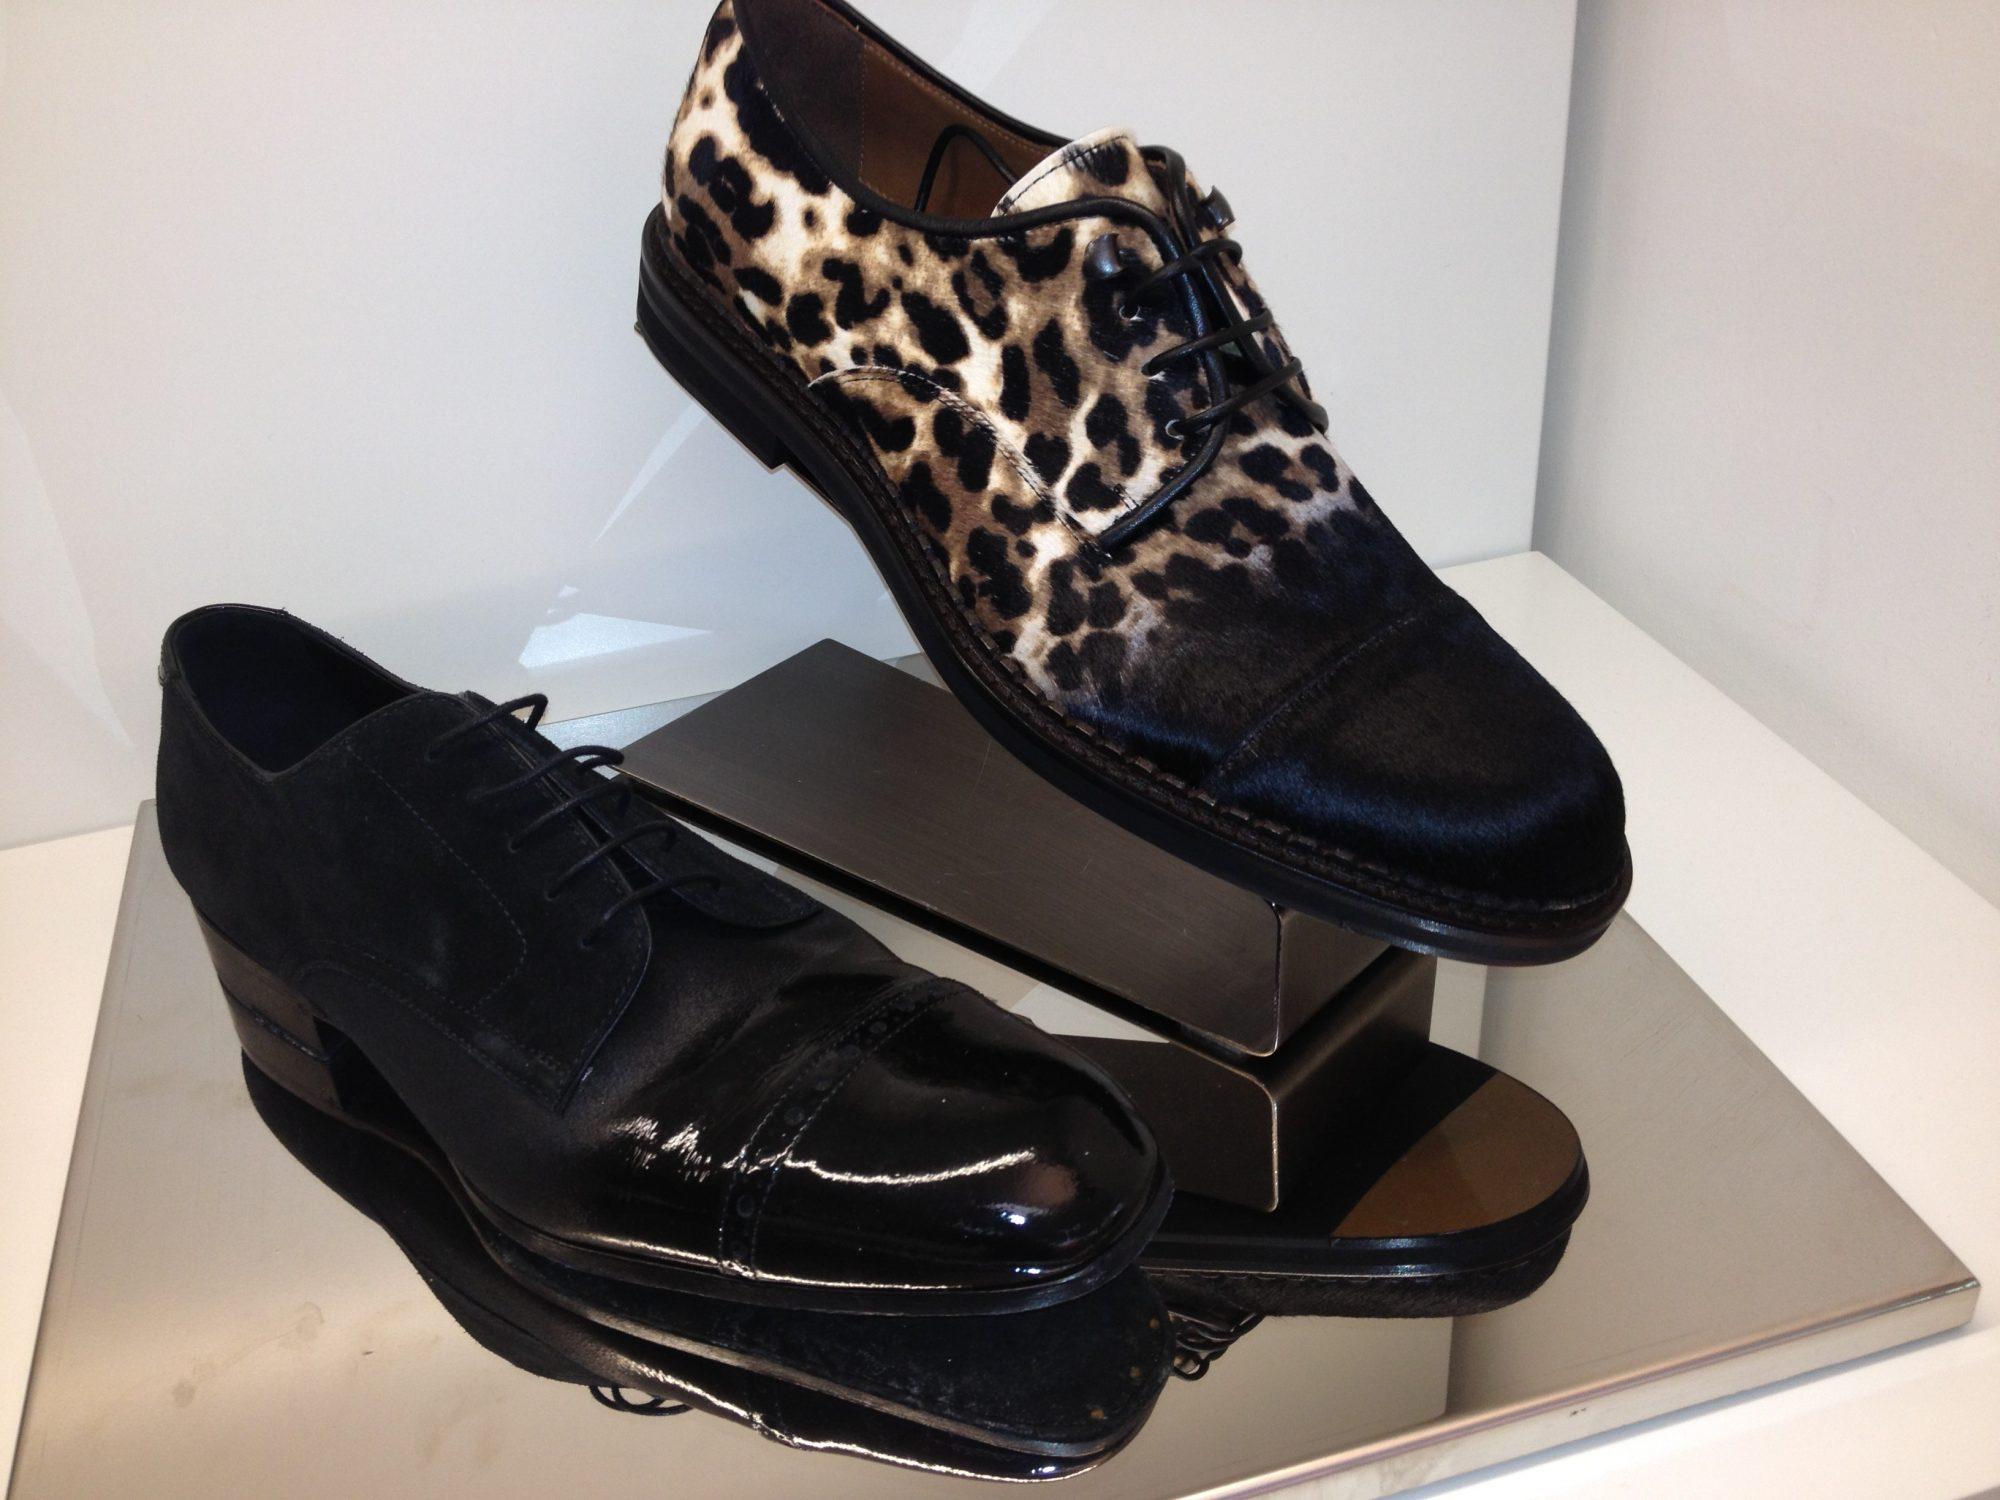 Jimmy-Choo-Mens-Cruise-2014-Whitcomb-Pony-Skin-Patent-Leather